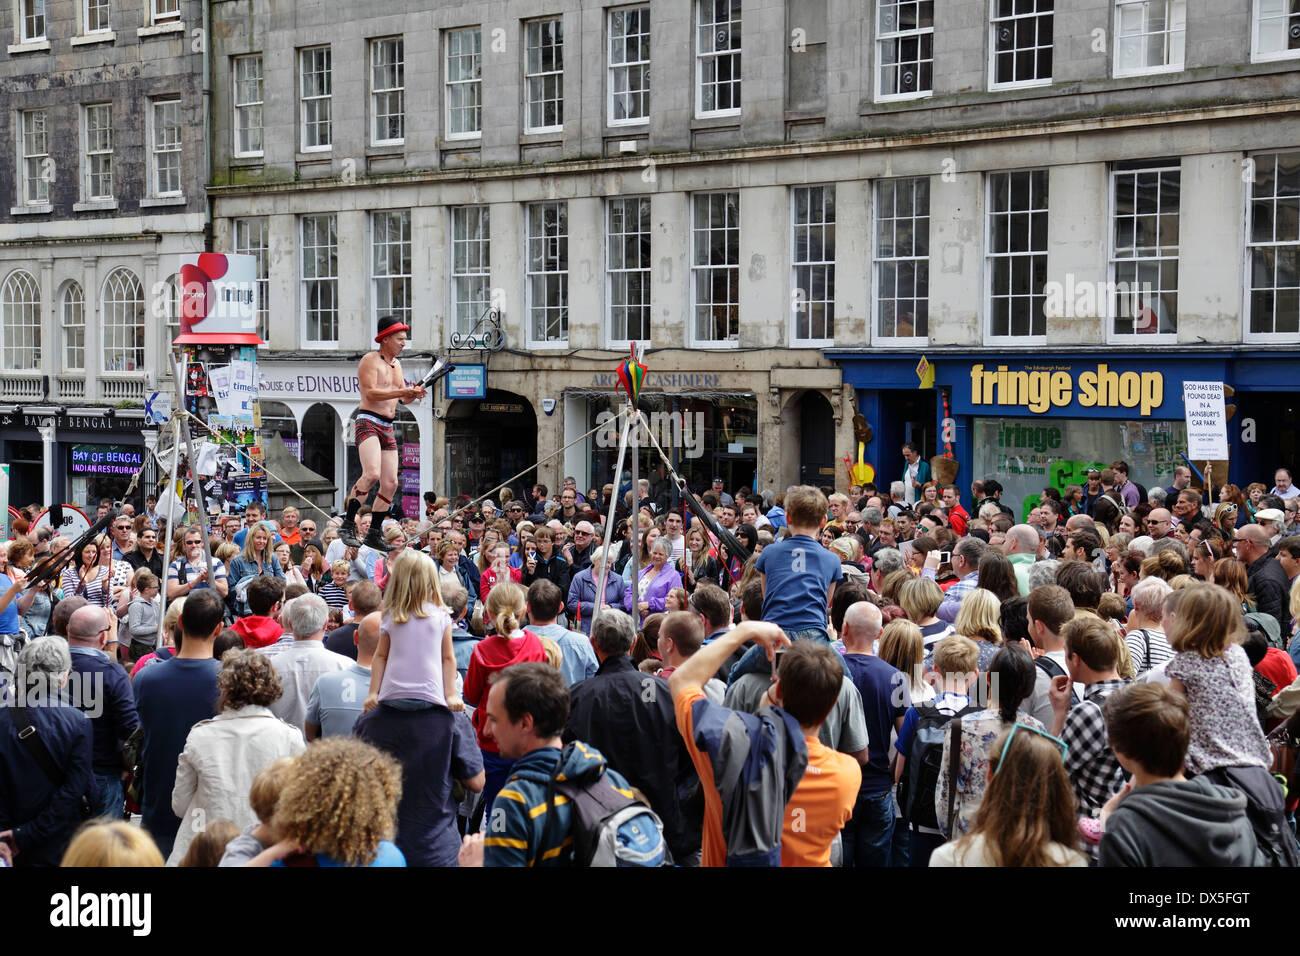 Slack Rope Walker performing on the Royal Mile at the Edinburgh Festival Fringe, Scotland, UK - Stock Image